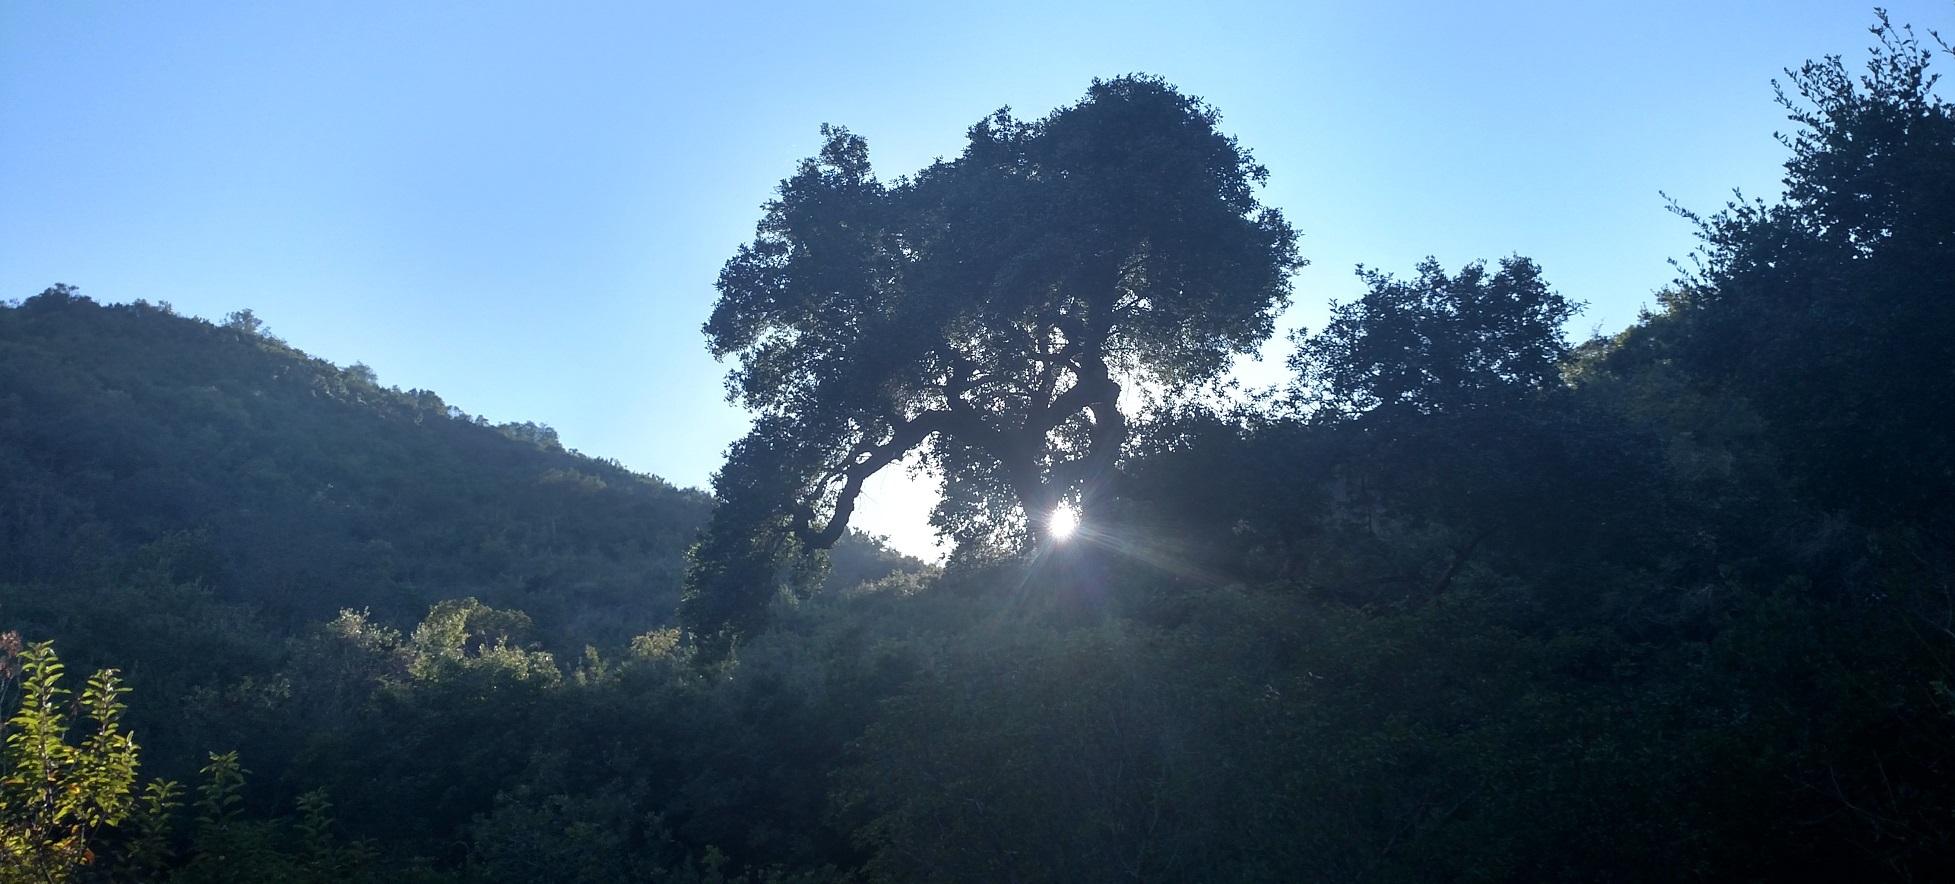 Laguna Coast Wilderness Park, Orange County